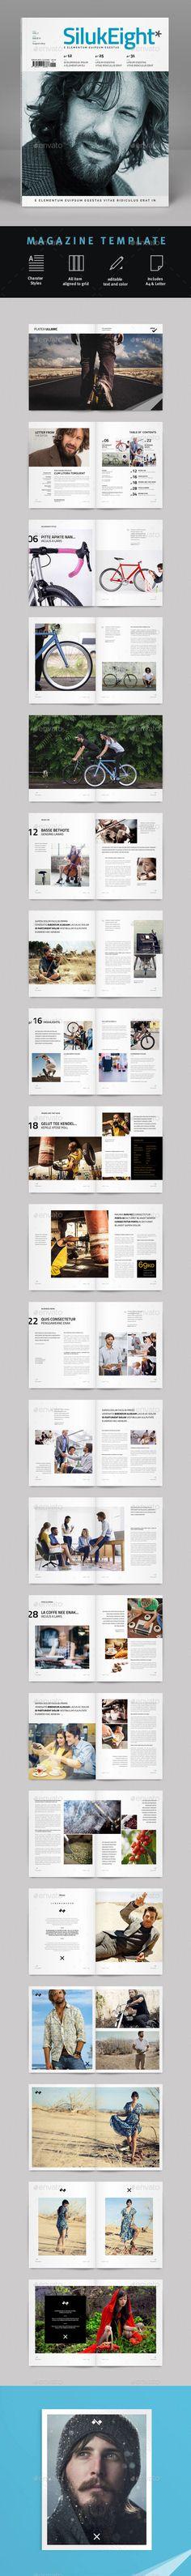 Magazine Template | #magazinetemplate #magazinedesign | Download: http://graphicriver.net/item/magazine-template/10068037?ref=ksioks